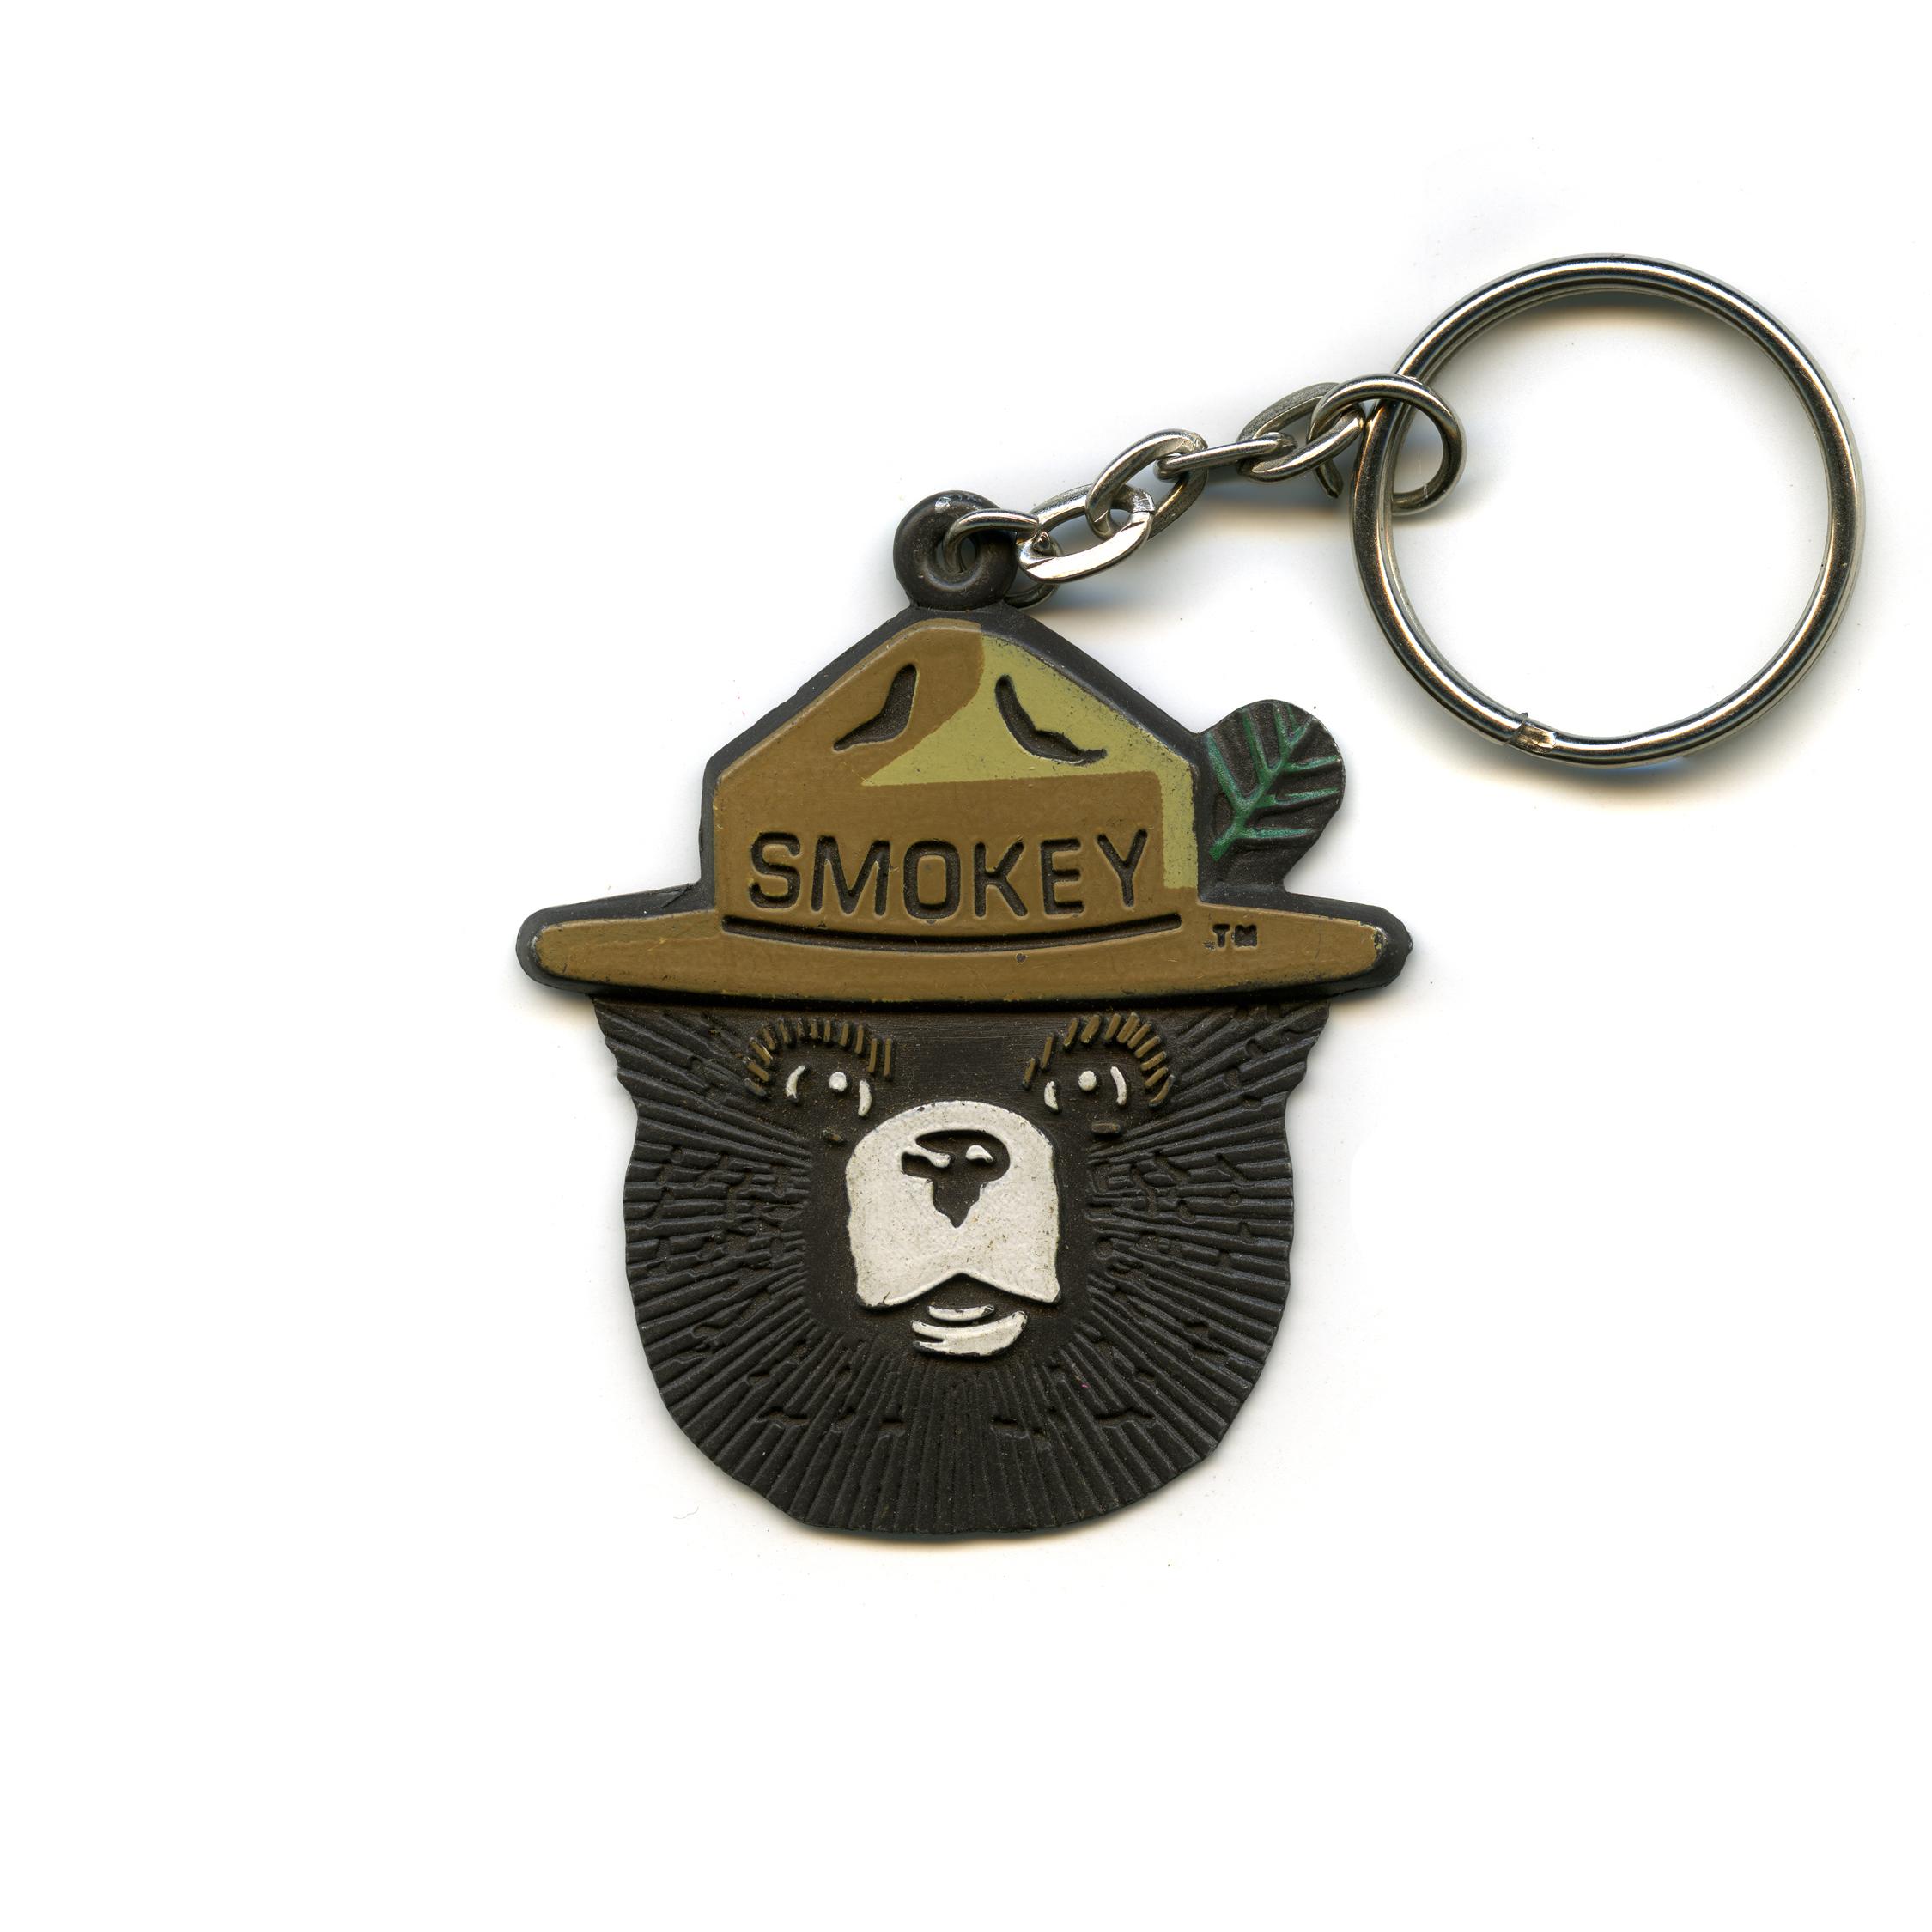 2003_smokey_the_bear_keychain.jpg